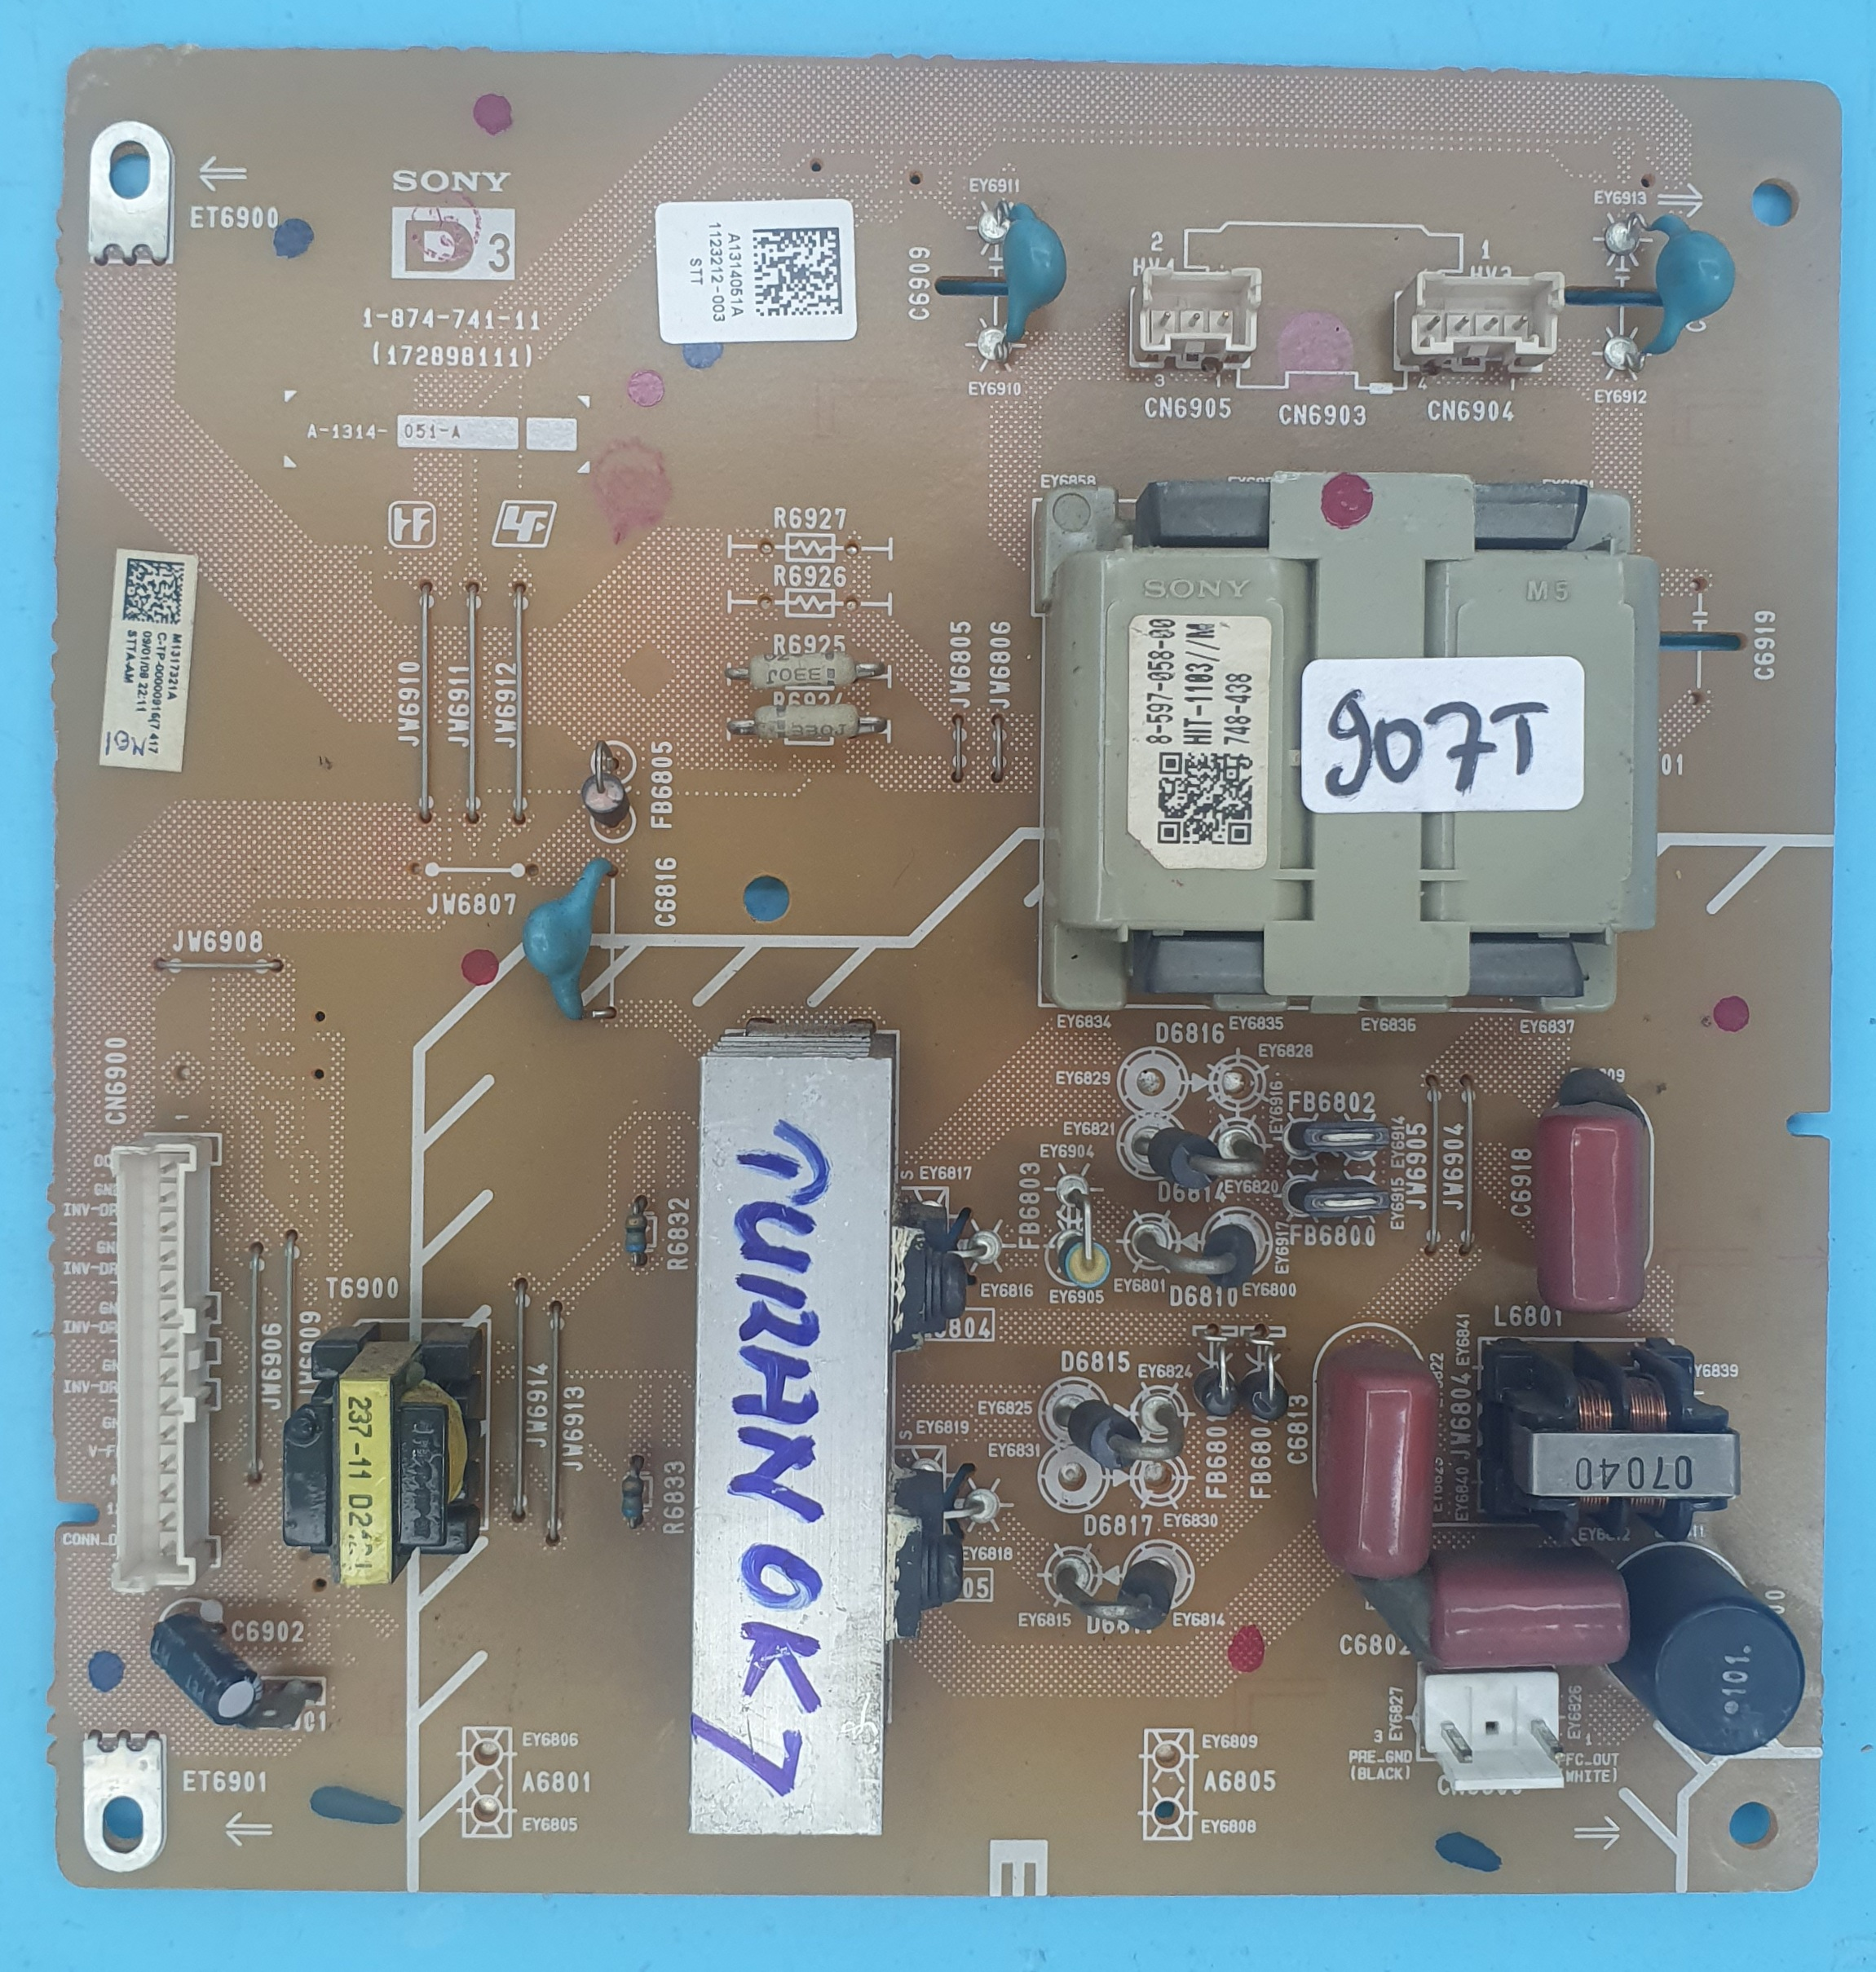 1-874-741-11 SONY POWER (KDV DAHİL = 118 TL)